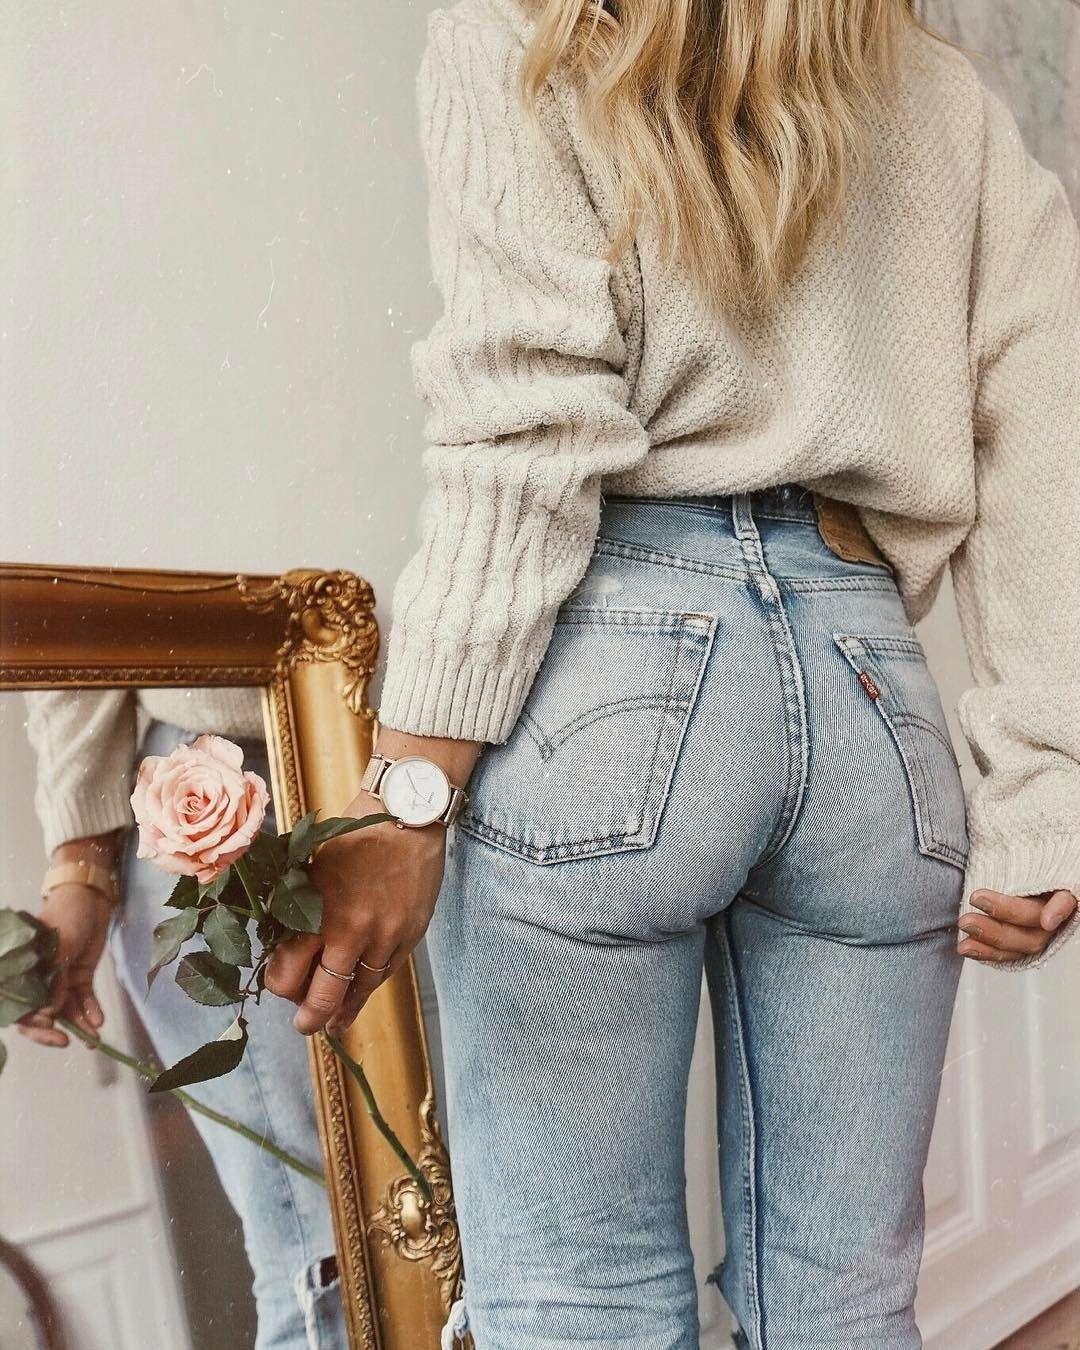 Isabella Thordsen ( isabellath) • Instagram photos and videos Levis Jeans 52c18231d1